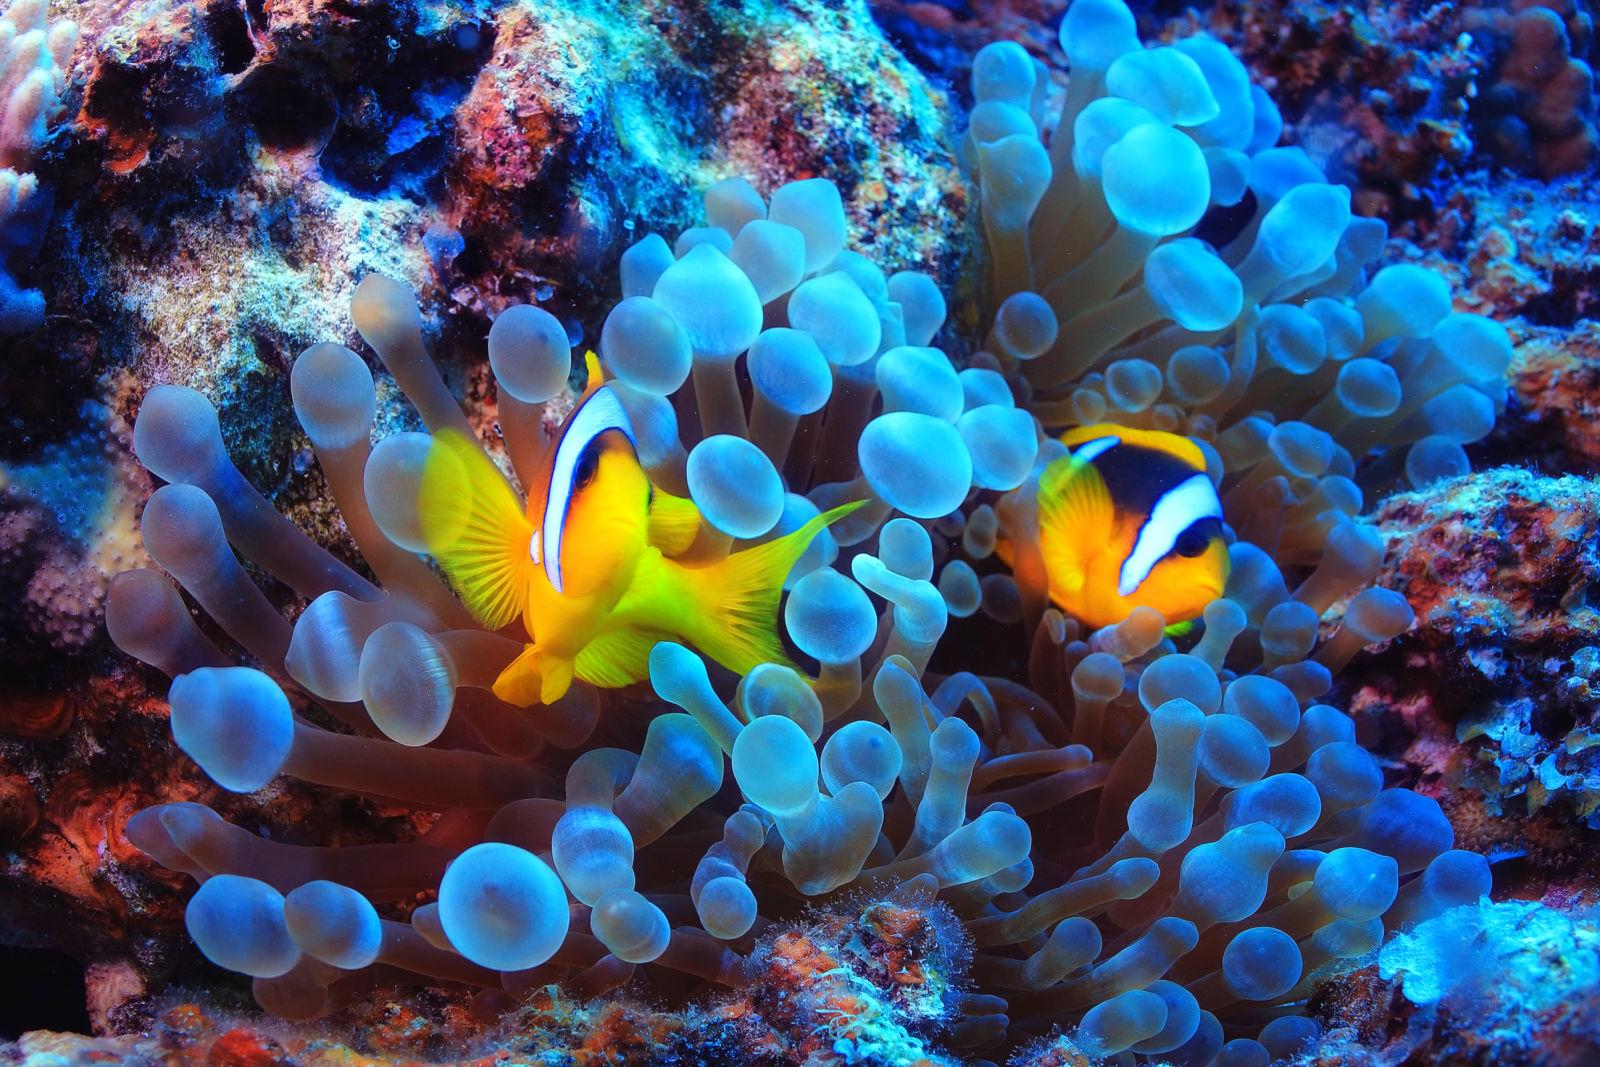 mediavault_images/Great_Barrier_Reef_AdobeStock_101285692_rxcpym